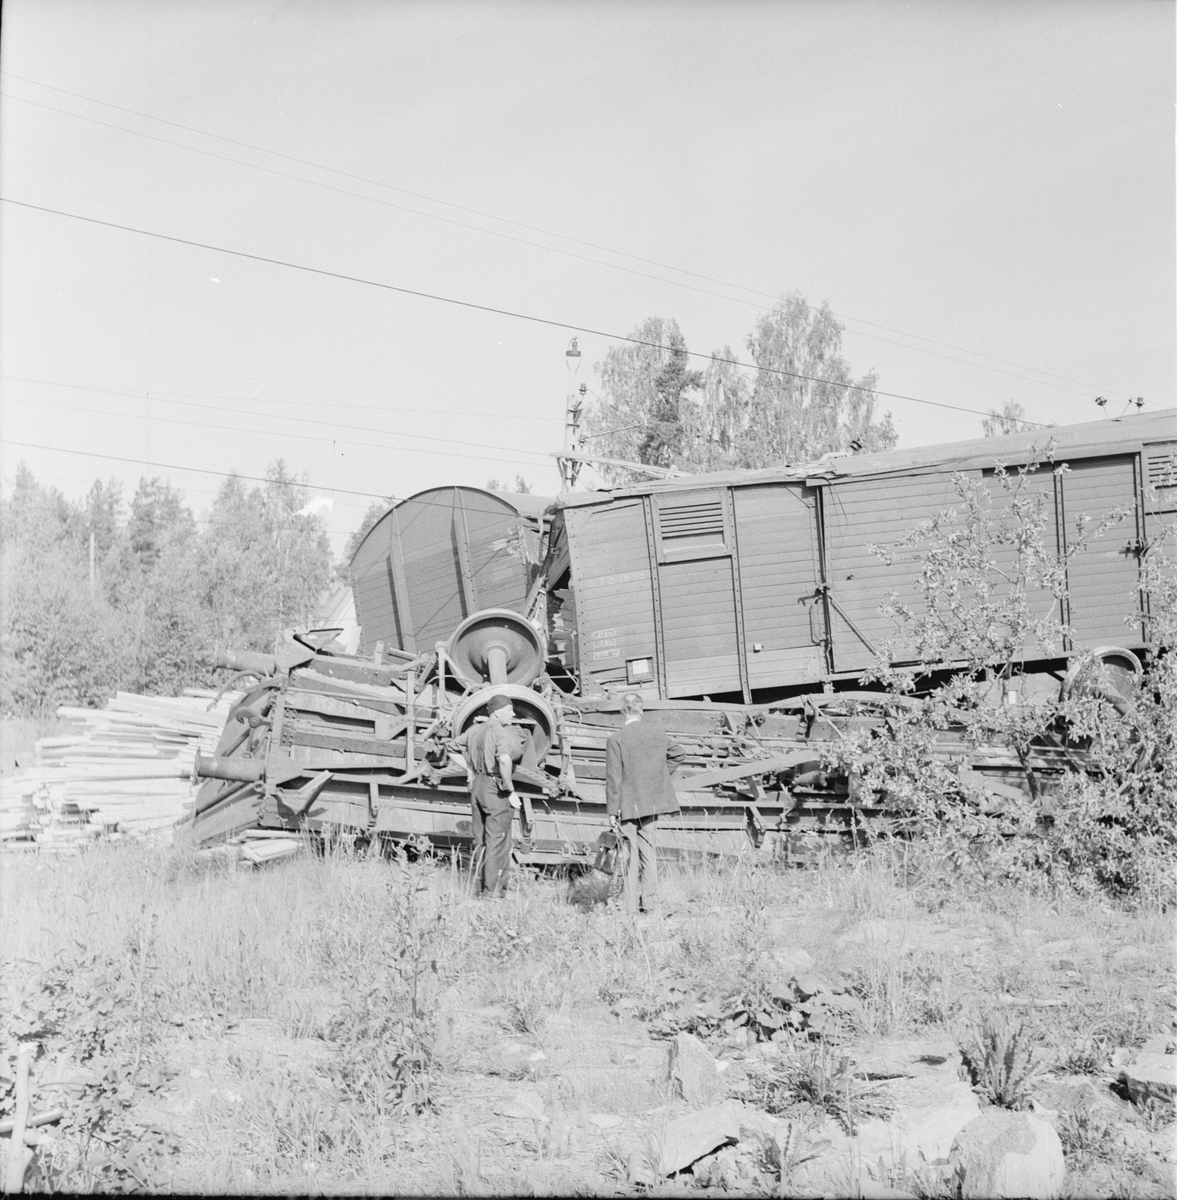 Lingbo, Tågurspårning, 5 Juli 1966